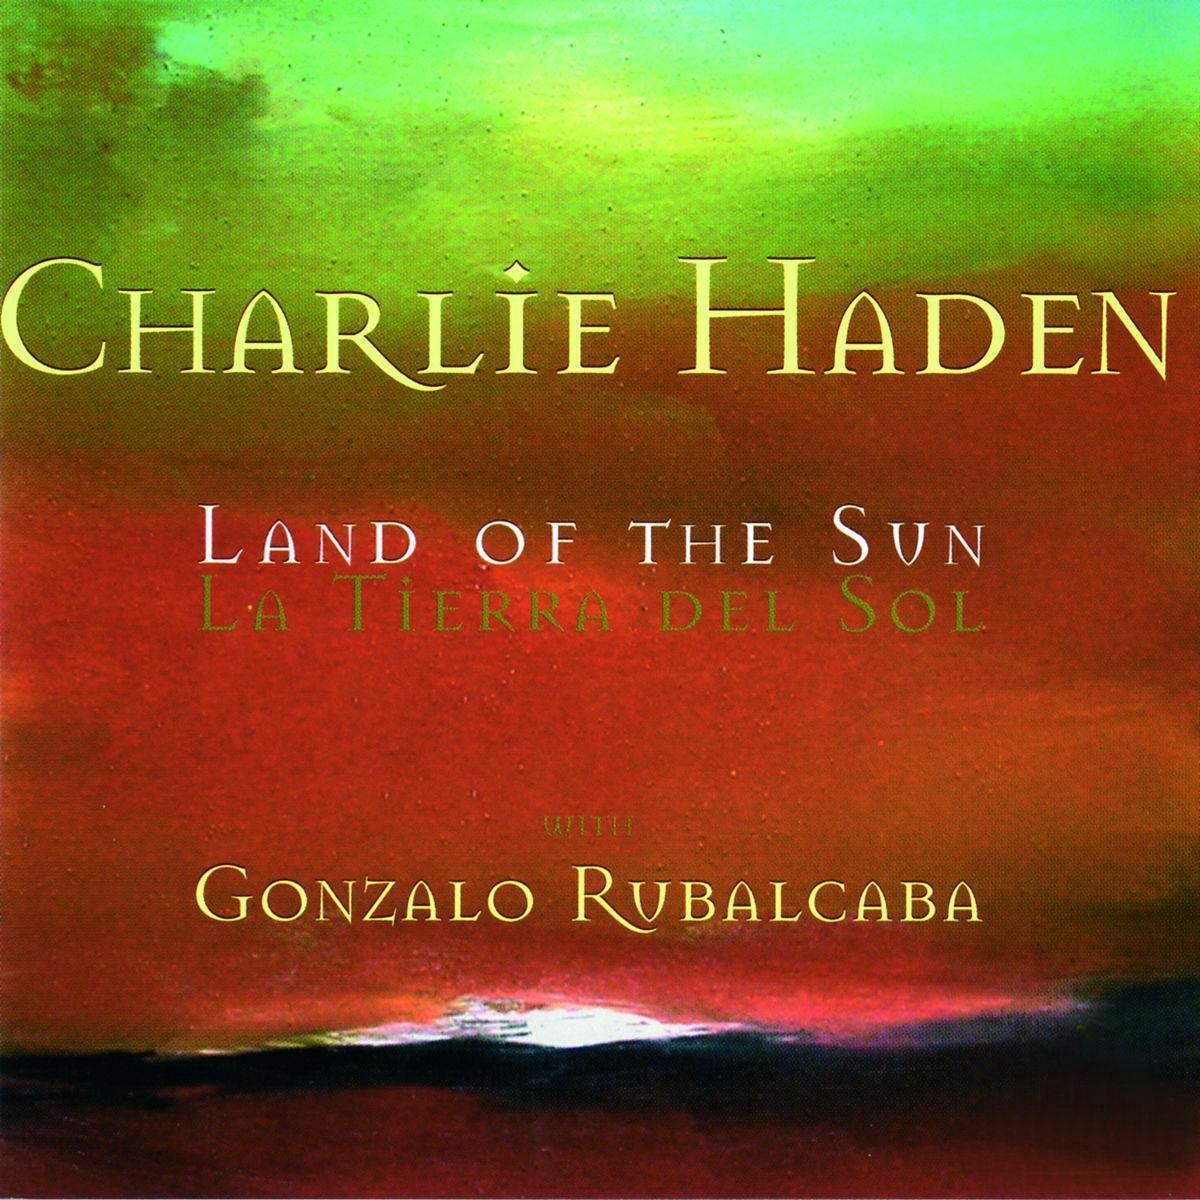 Haden Charlie/Rubalcaba Gonzalo - Land Of The Sun - Charlie Haden